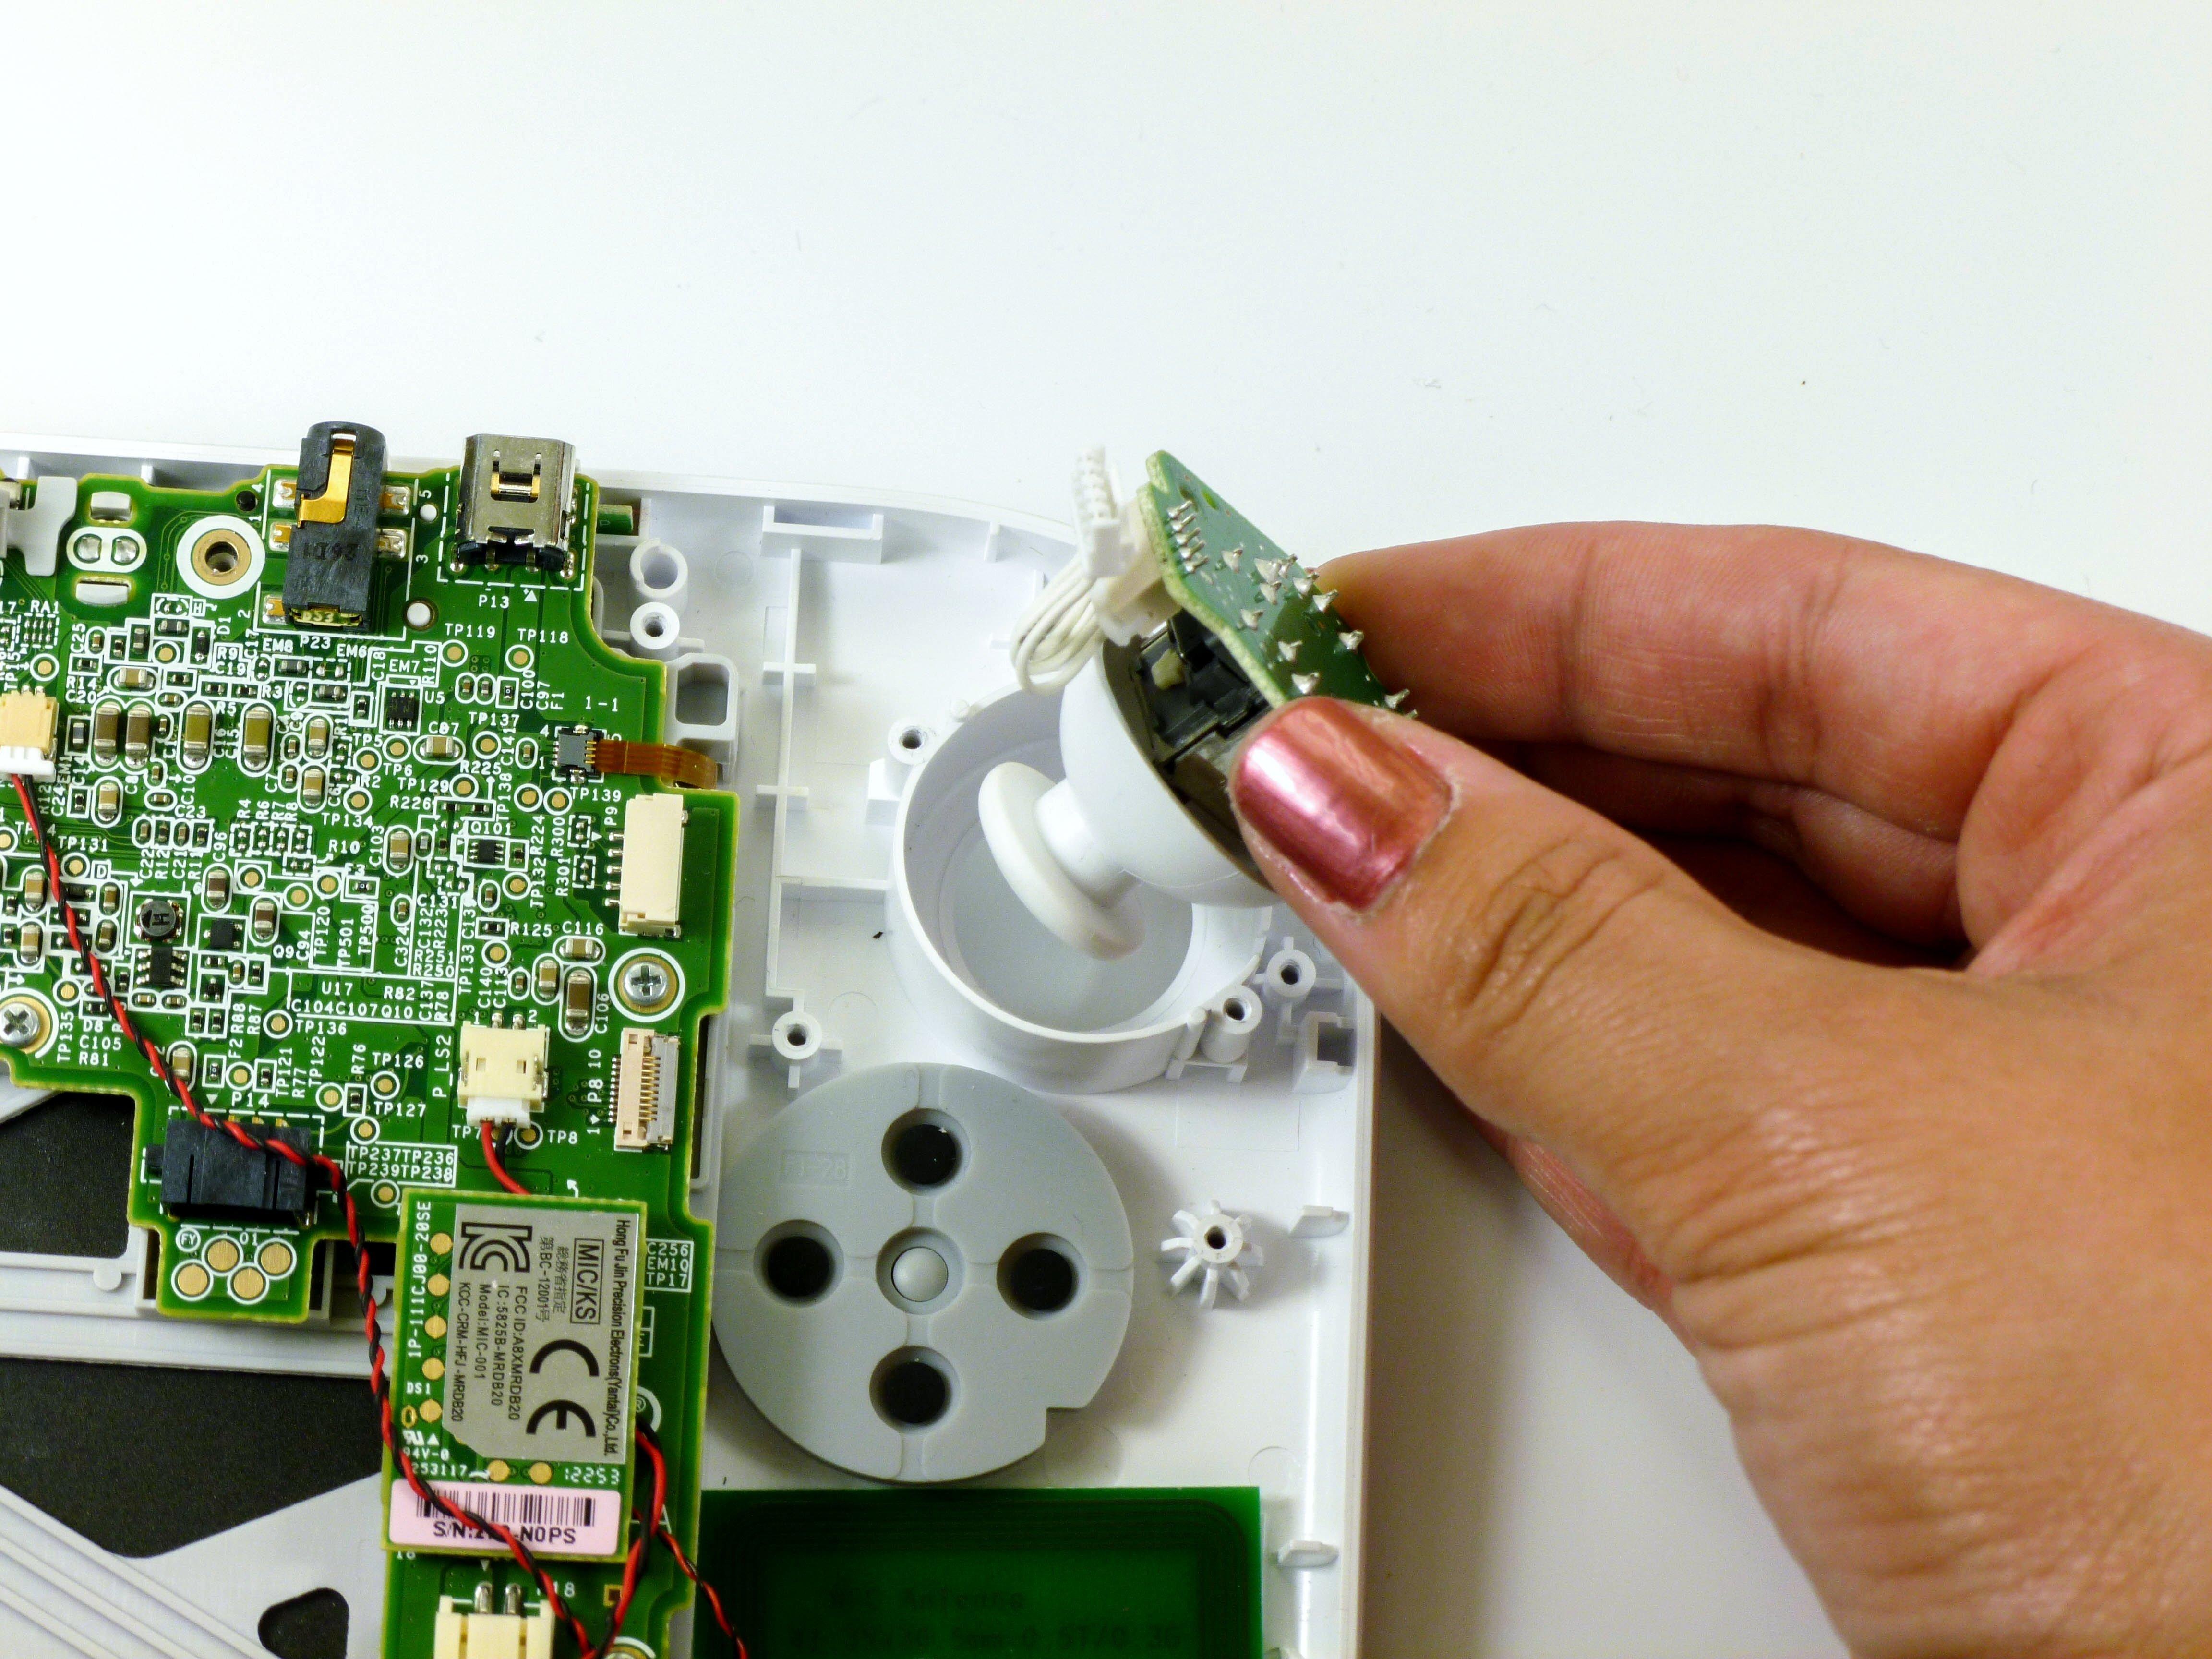 Remplacement du stick analogique du Wii U GamePad Nintendo